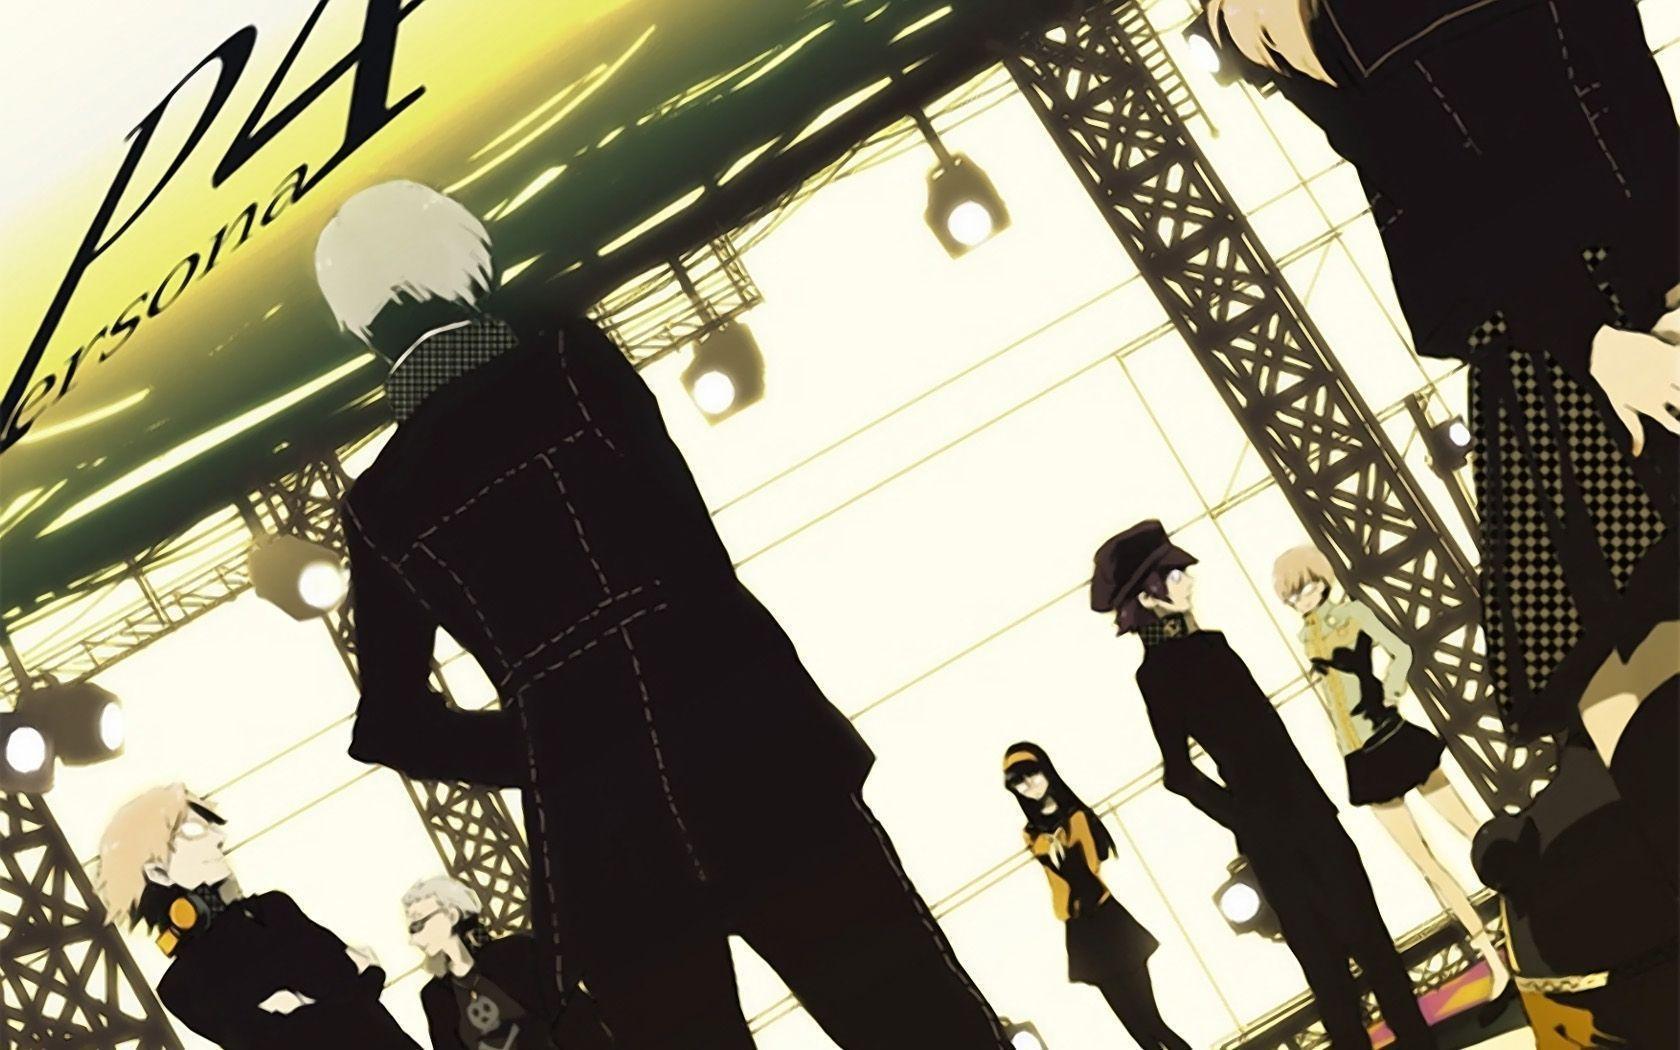 Persona 3 Wallpaper 4k: Persona 4 Wallpapers